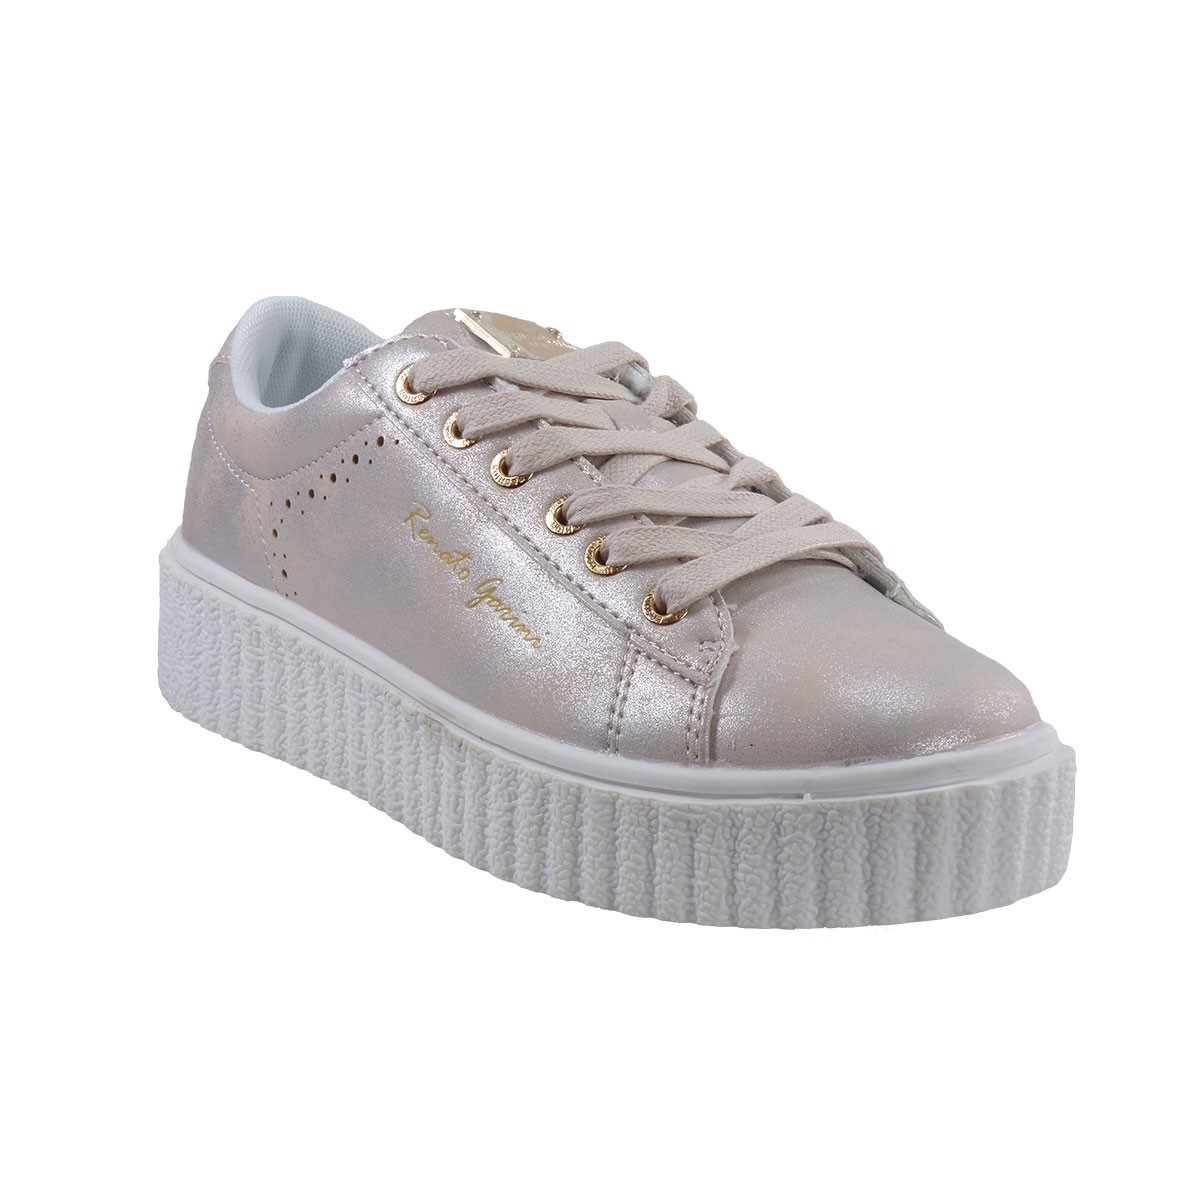 9ec6d7202ac Renato Garini Γυναικεία Παπούτσια Sneakers 161-705161 Ροζ |Γυναικεία & Ανδρικά  Παπούτσια - BagiotaShoes.gr